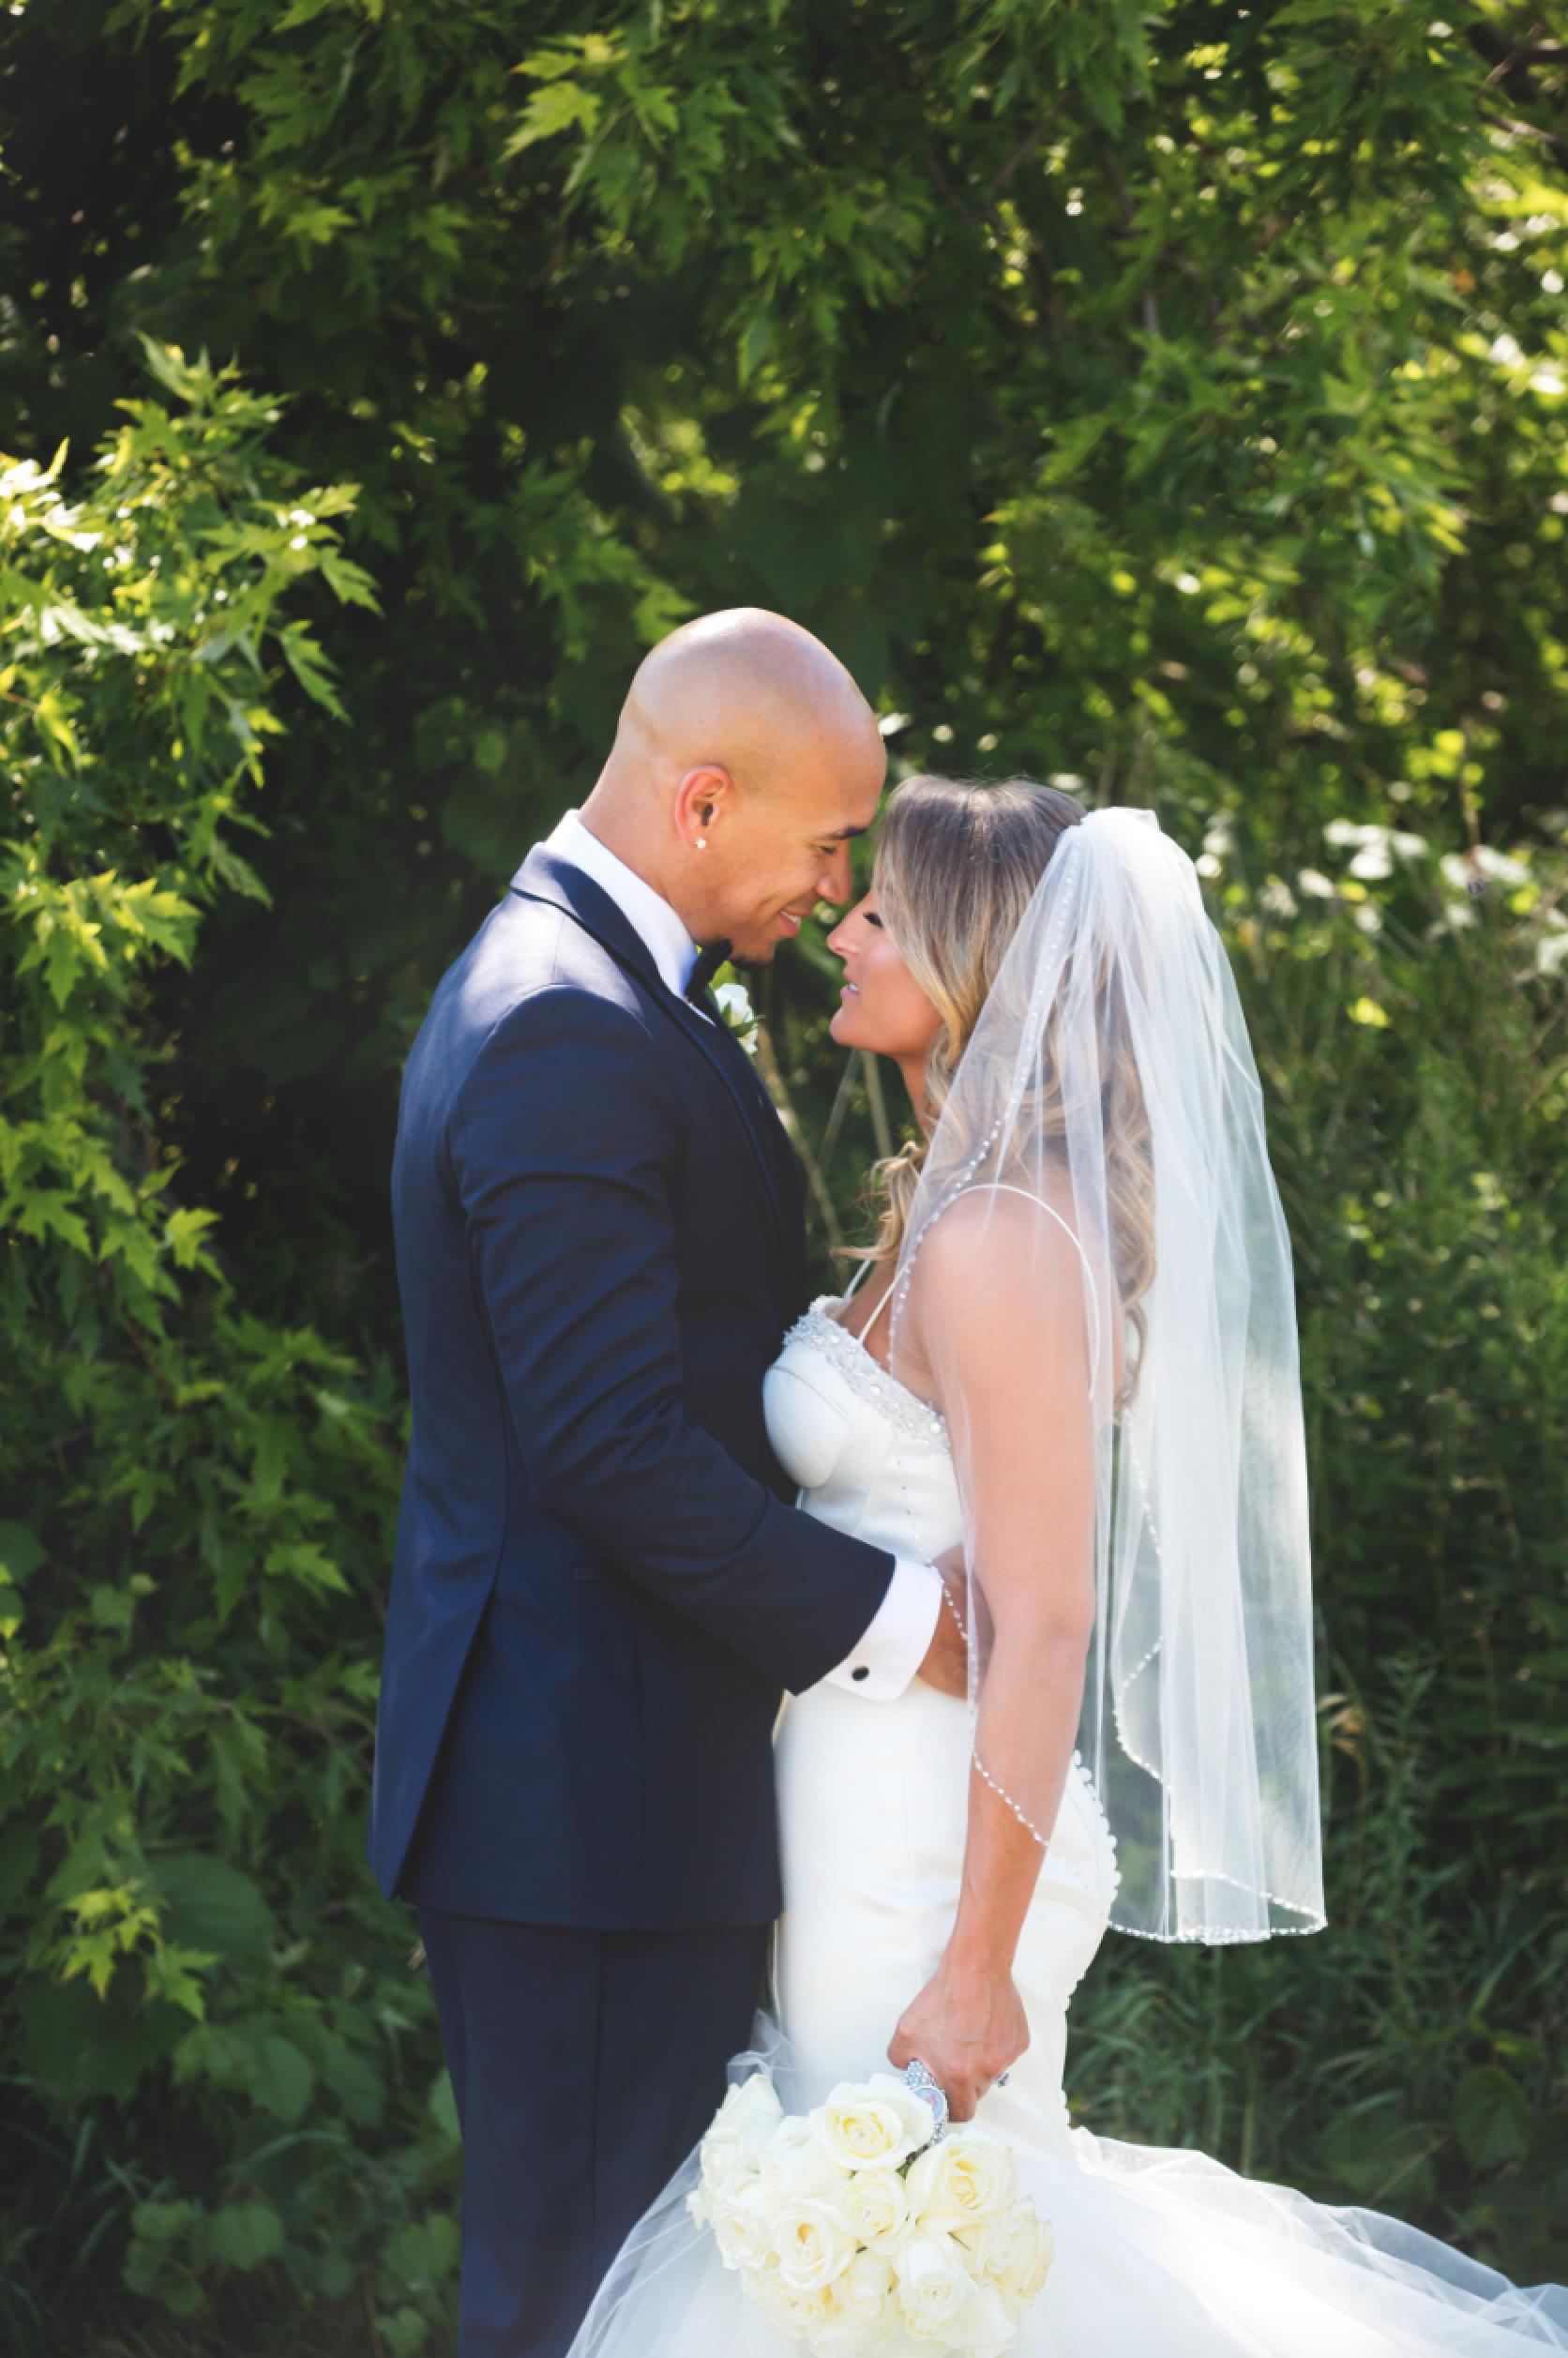 Wedding-Burlington-Convention-Center-Burlington-Oakville-Toronto-Hamilton-Niagara-Wedding-Photographer-Photography-Moments-by-Lauren-Photo-Image-32.png